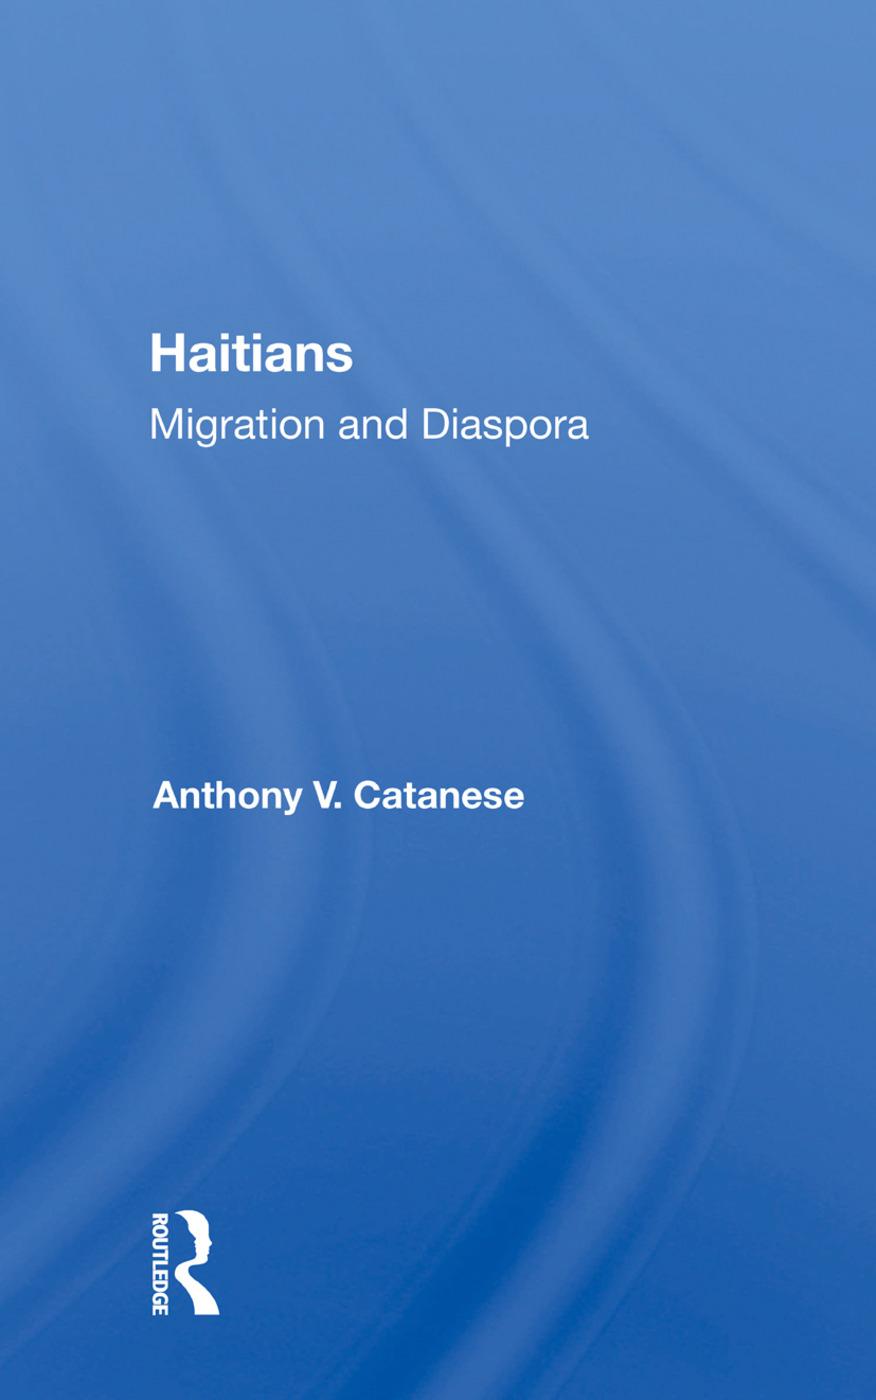 Haitians: Migration And Diaspora, 1st Edition (Paperback) book cover